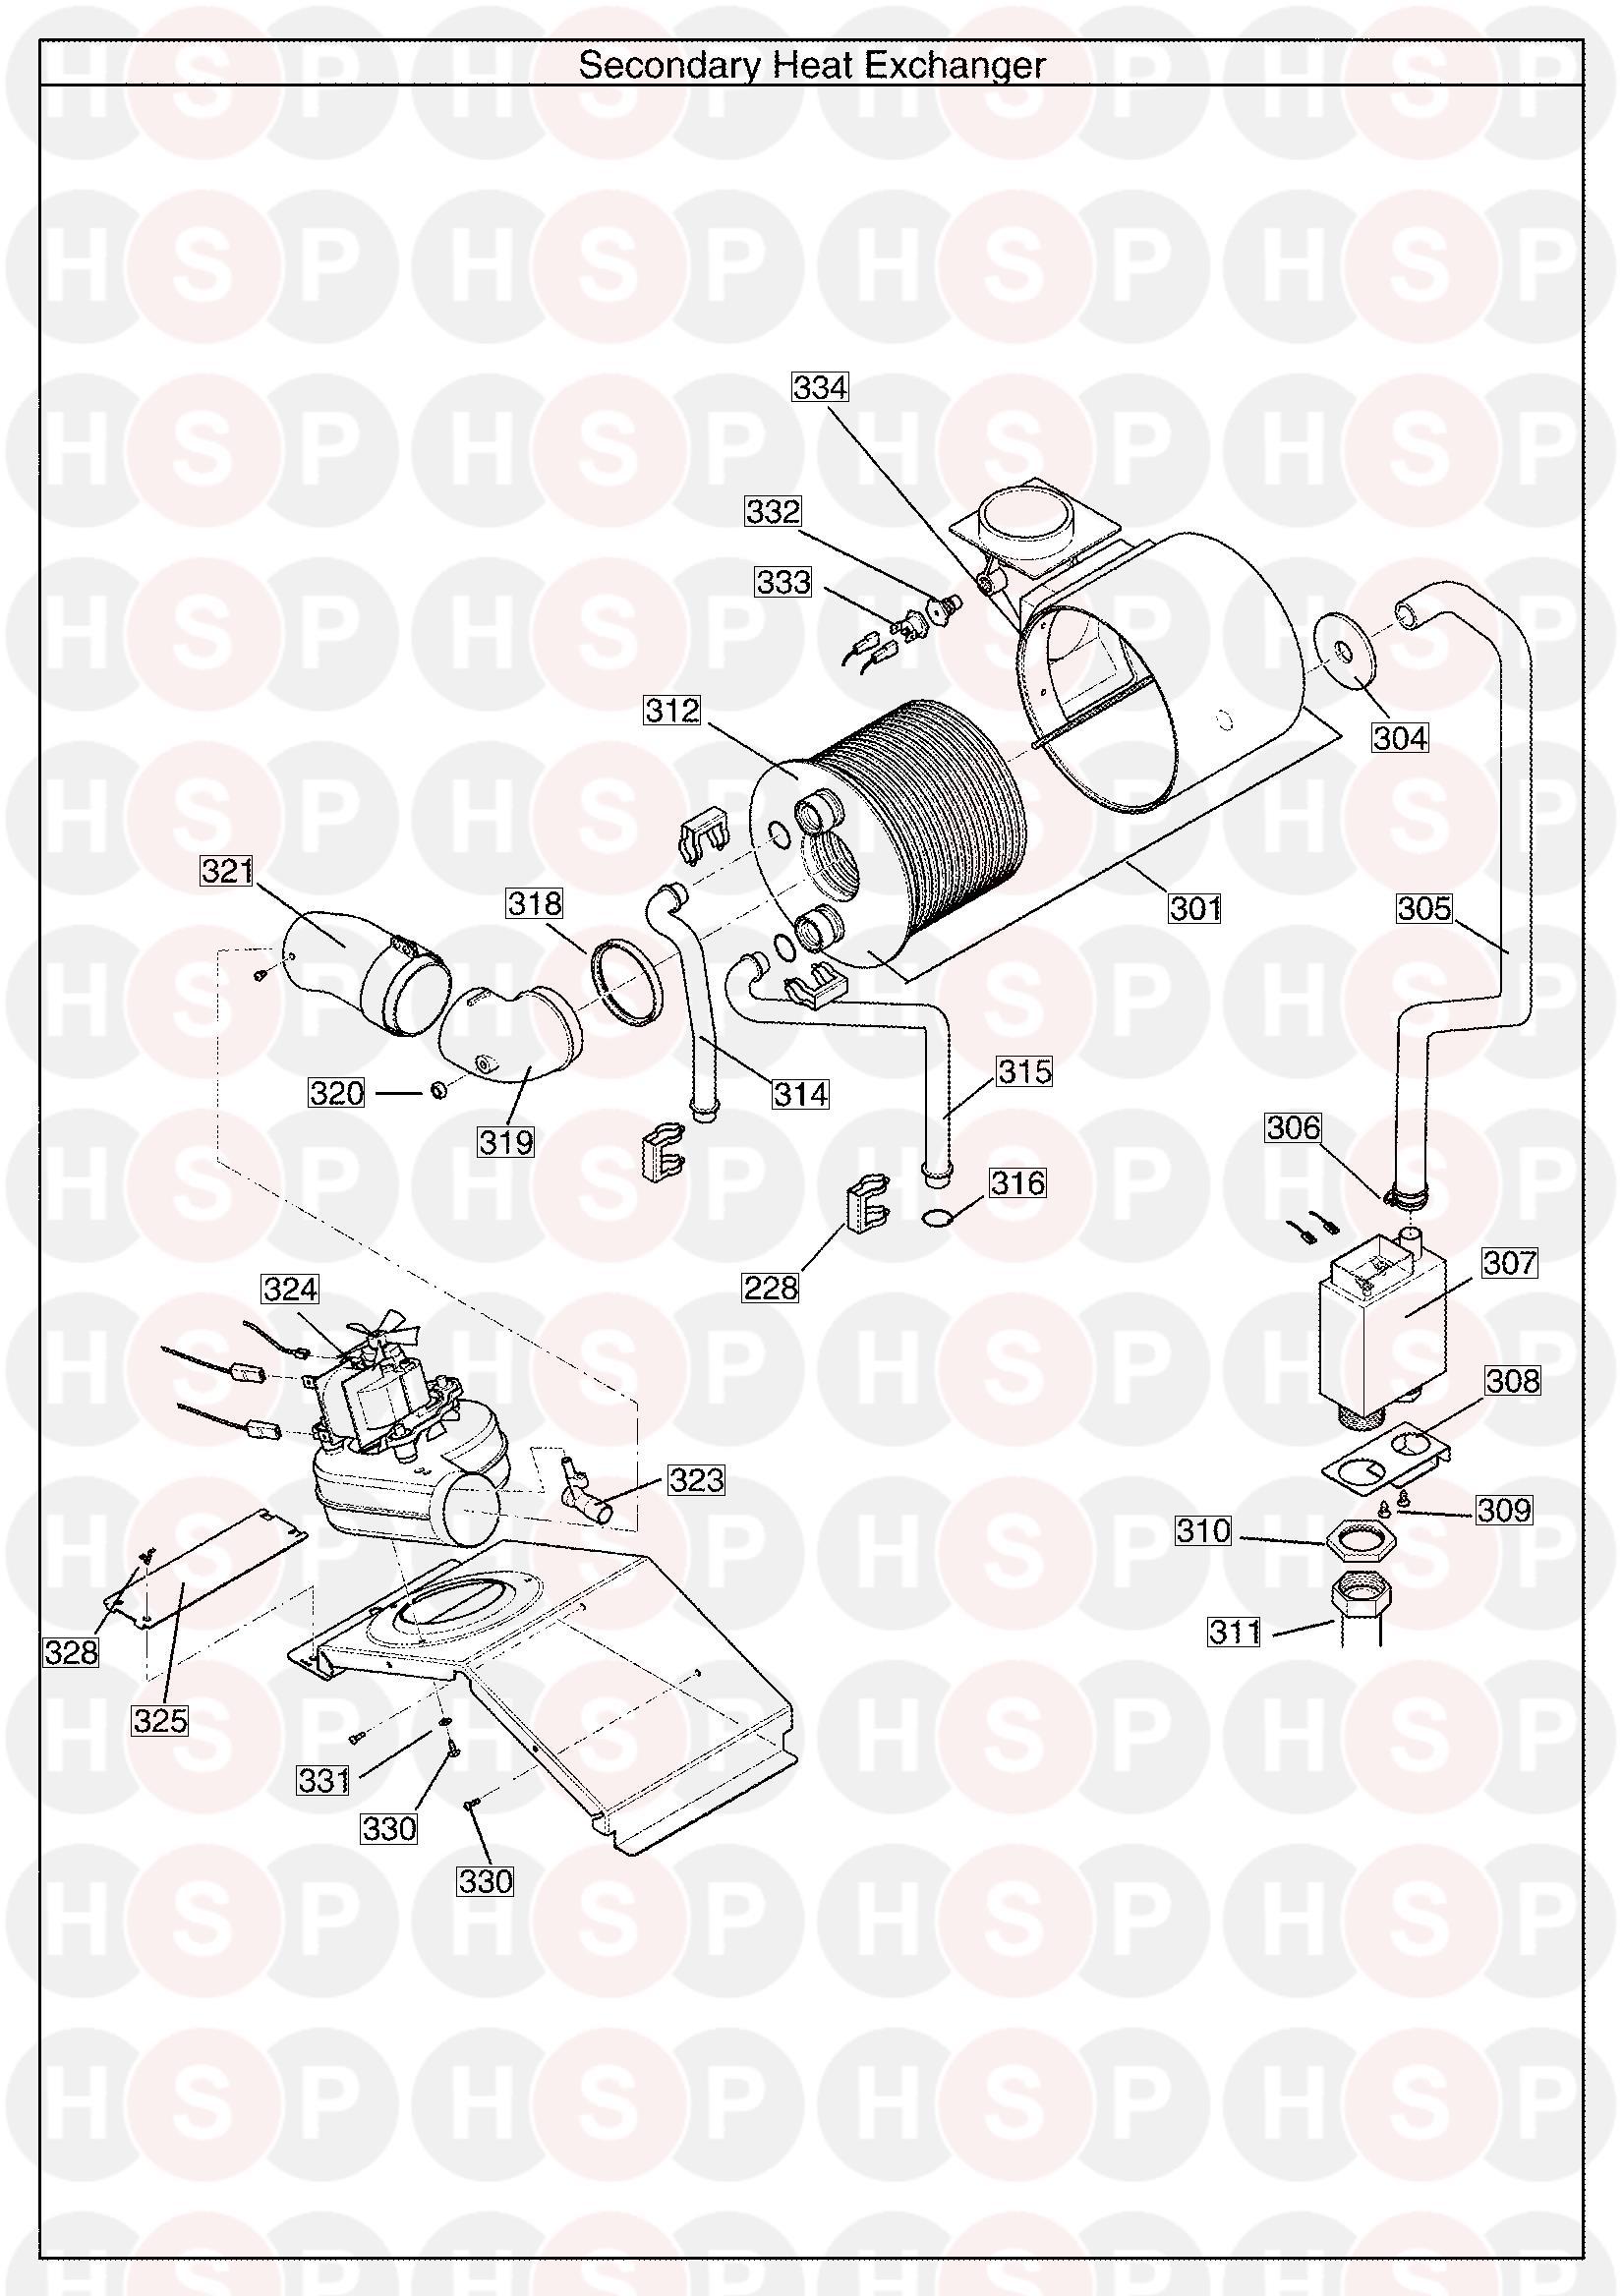 Potterton Performa 24 >> Home Furniture Diy Potterton Performa 24 28 28i Boiler